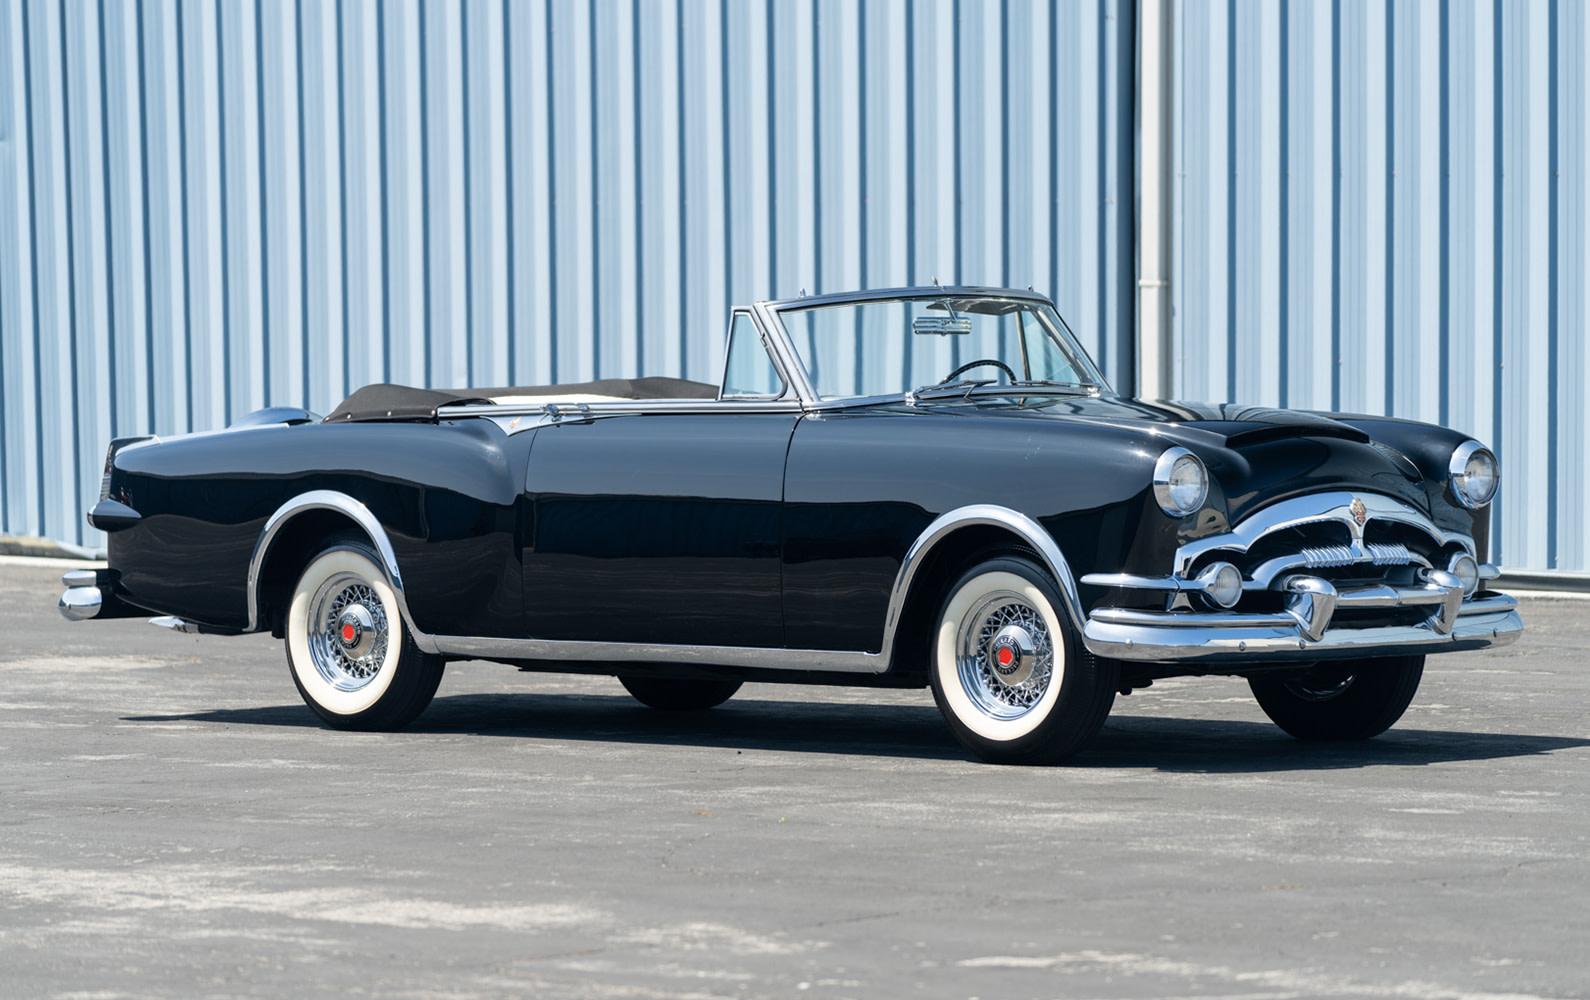 Prod/O21F - May 2021/1489_1953 Packard Caribbean Convertible/1953_Packard_Caribbean_Convertible-24_JPEG_Press_in6tr7